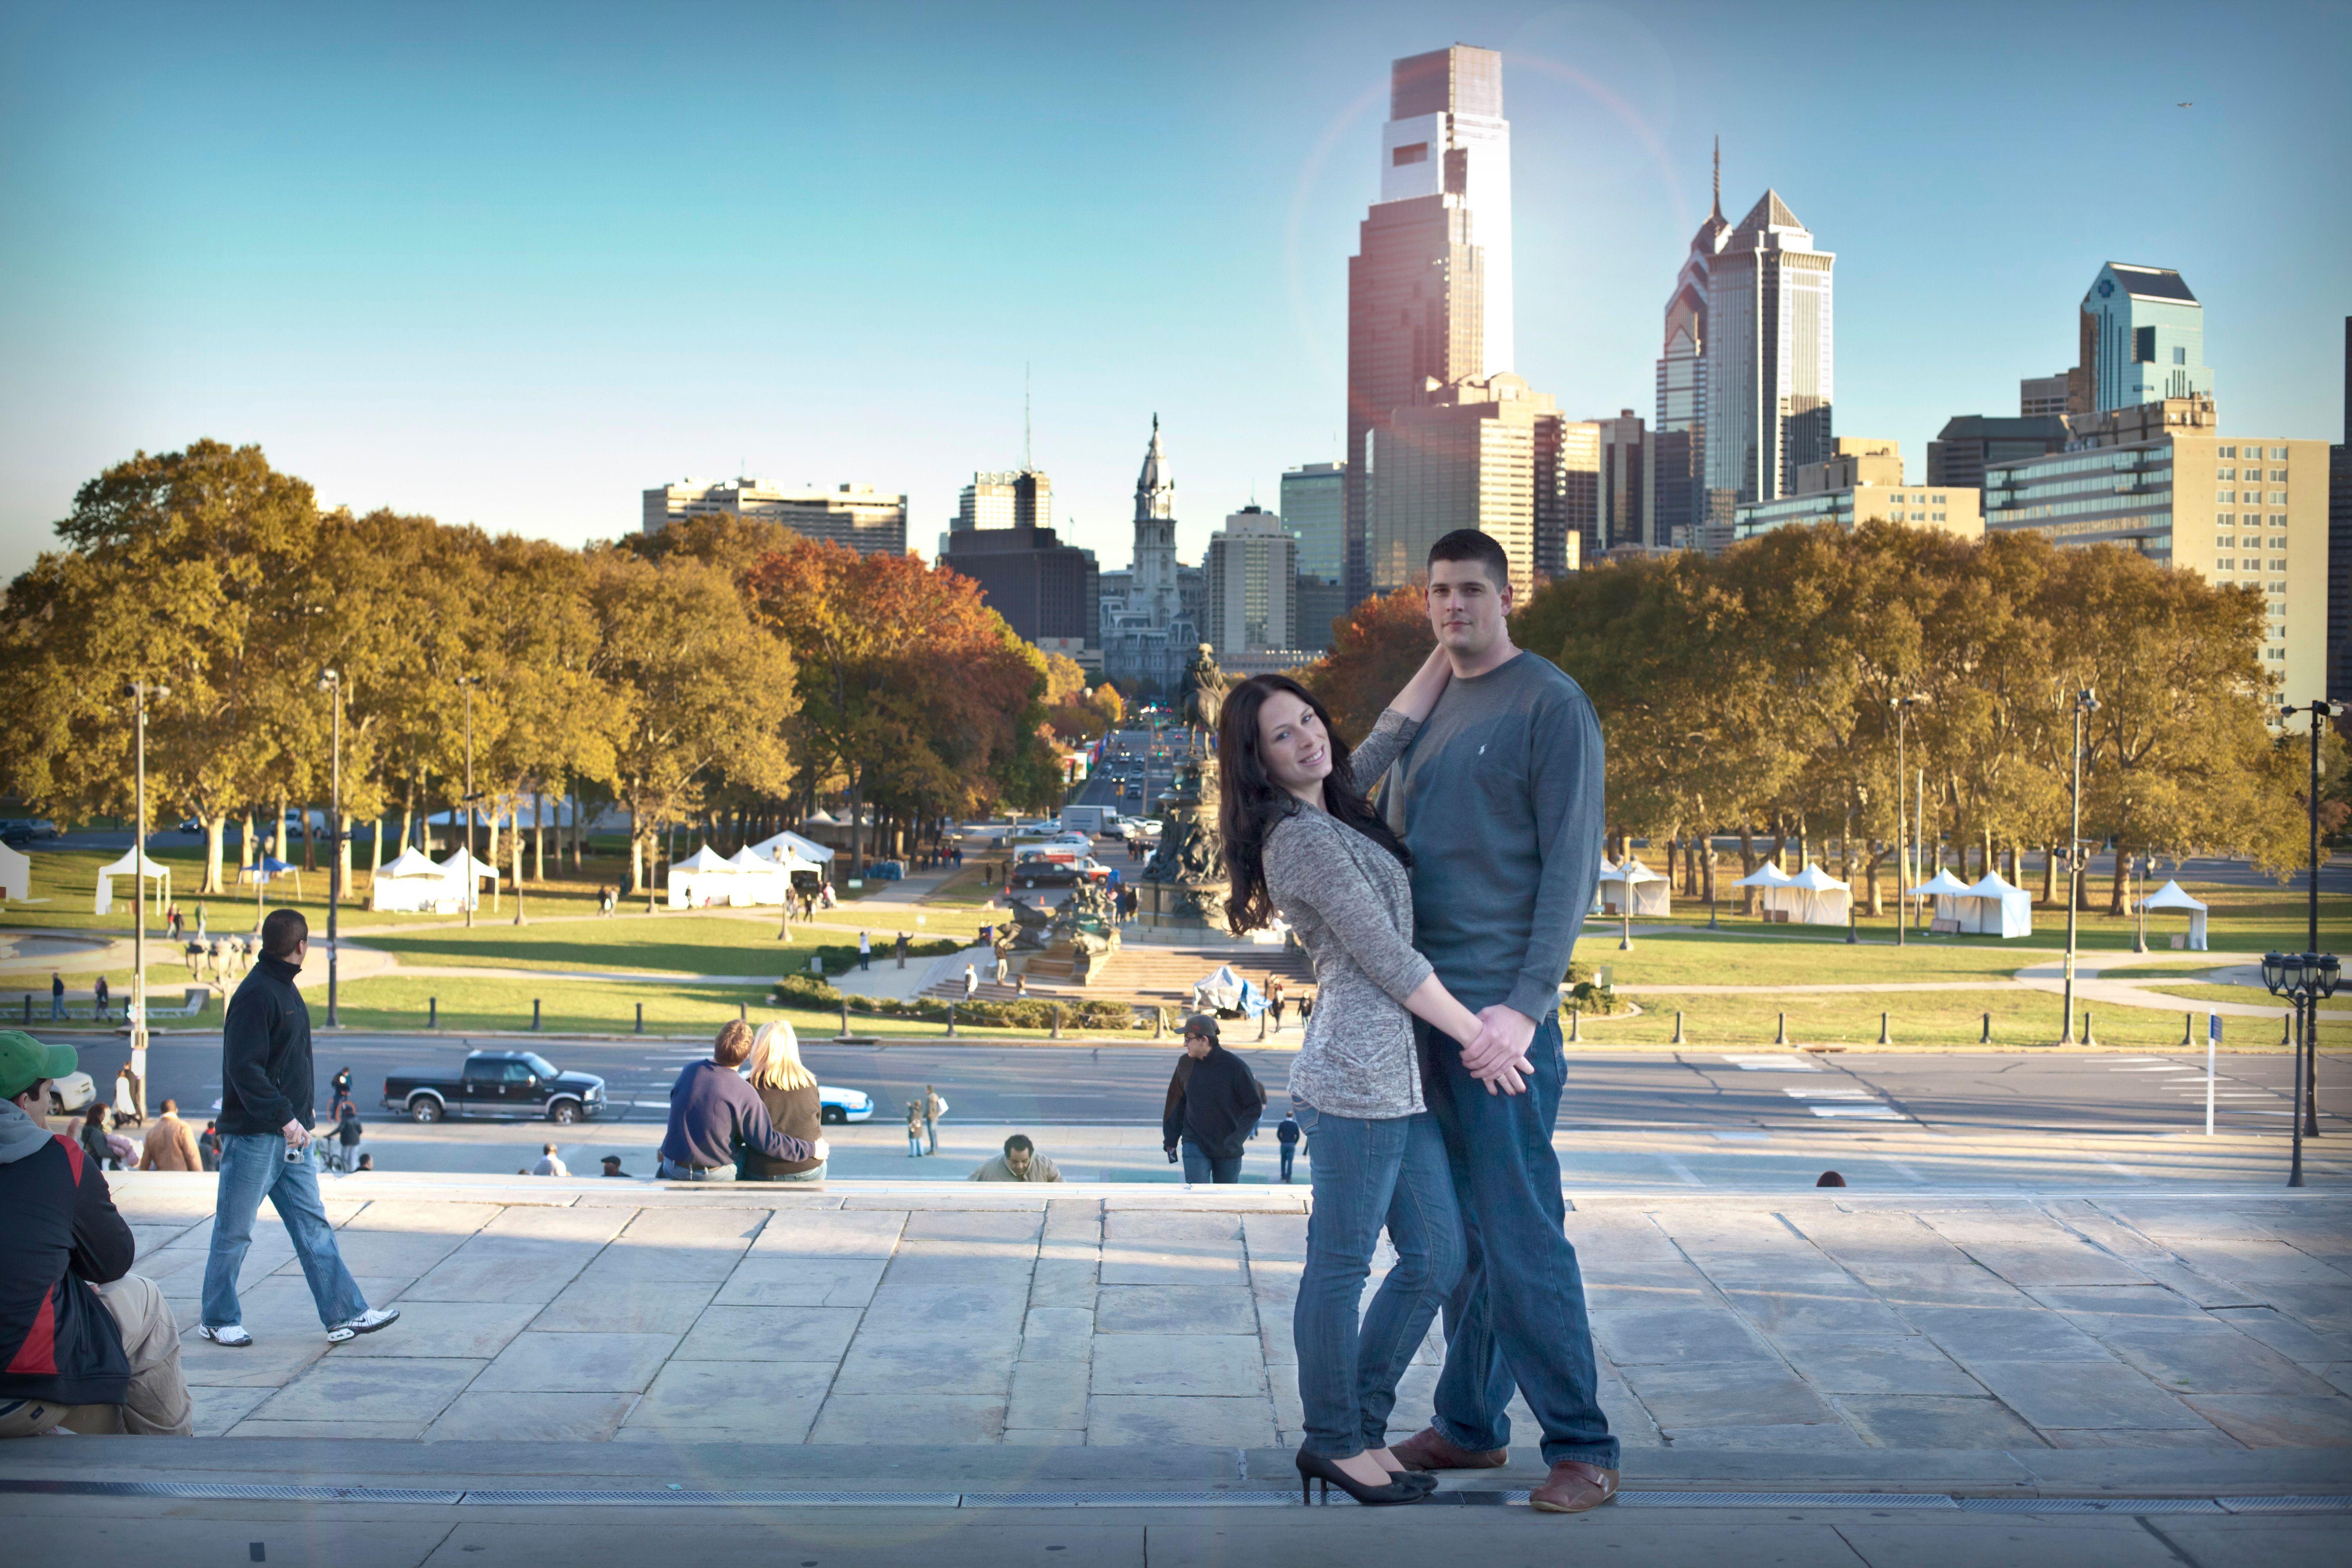 Love from Philadelphia Dolores park, Park, Travel